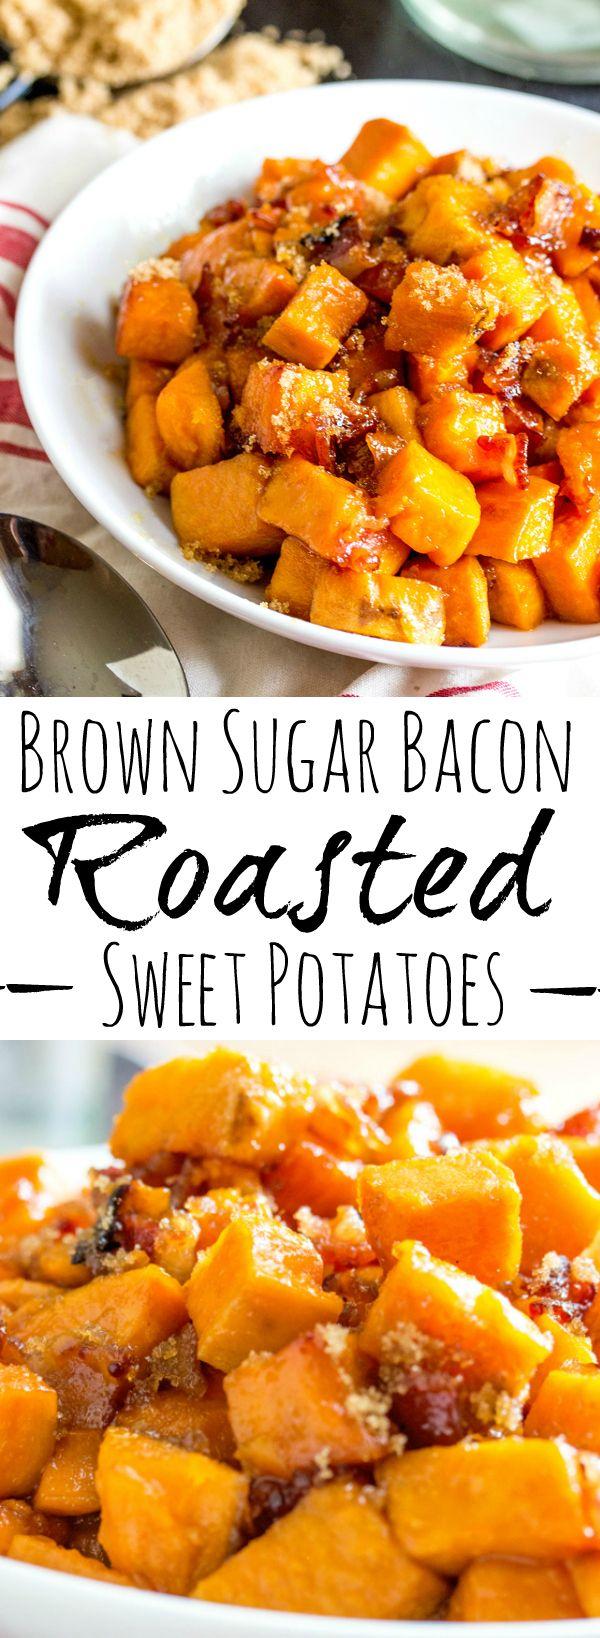 Brown Sugar Bacon Roasted Sweet Potatoes #dinnersidedishes